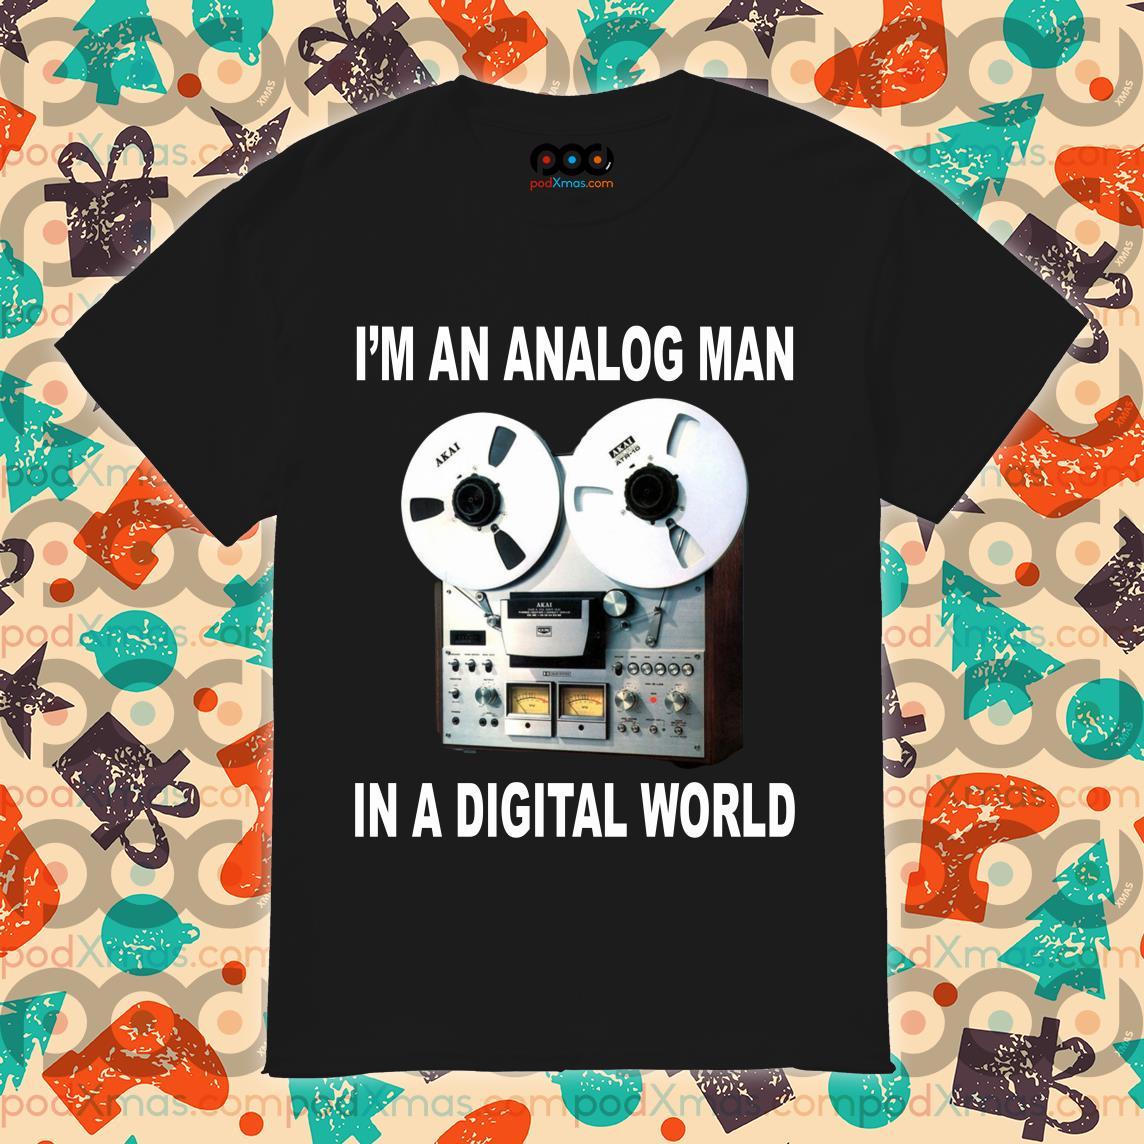 I'm an analog man in a digital world shirt